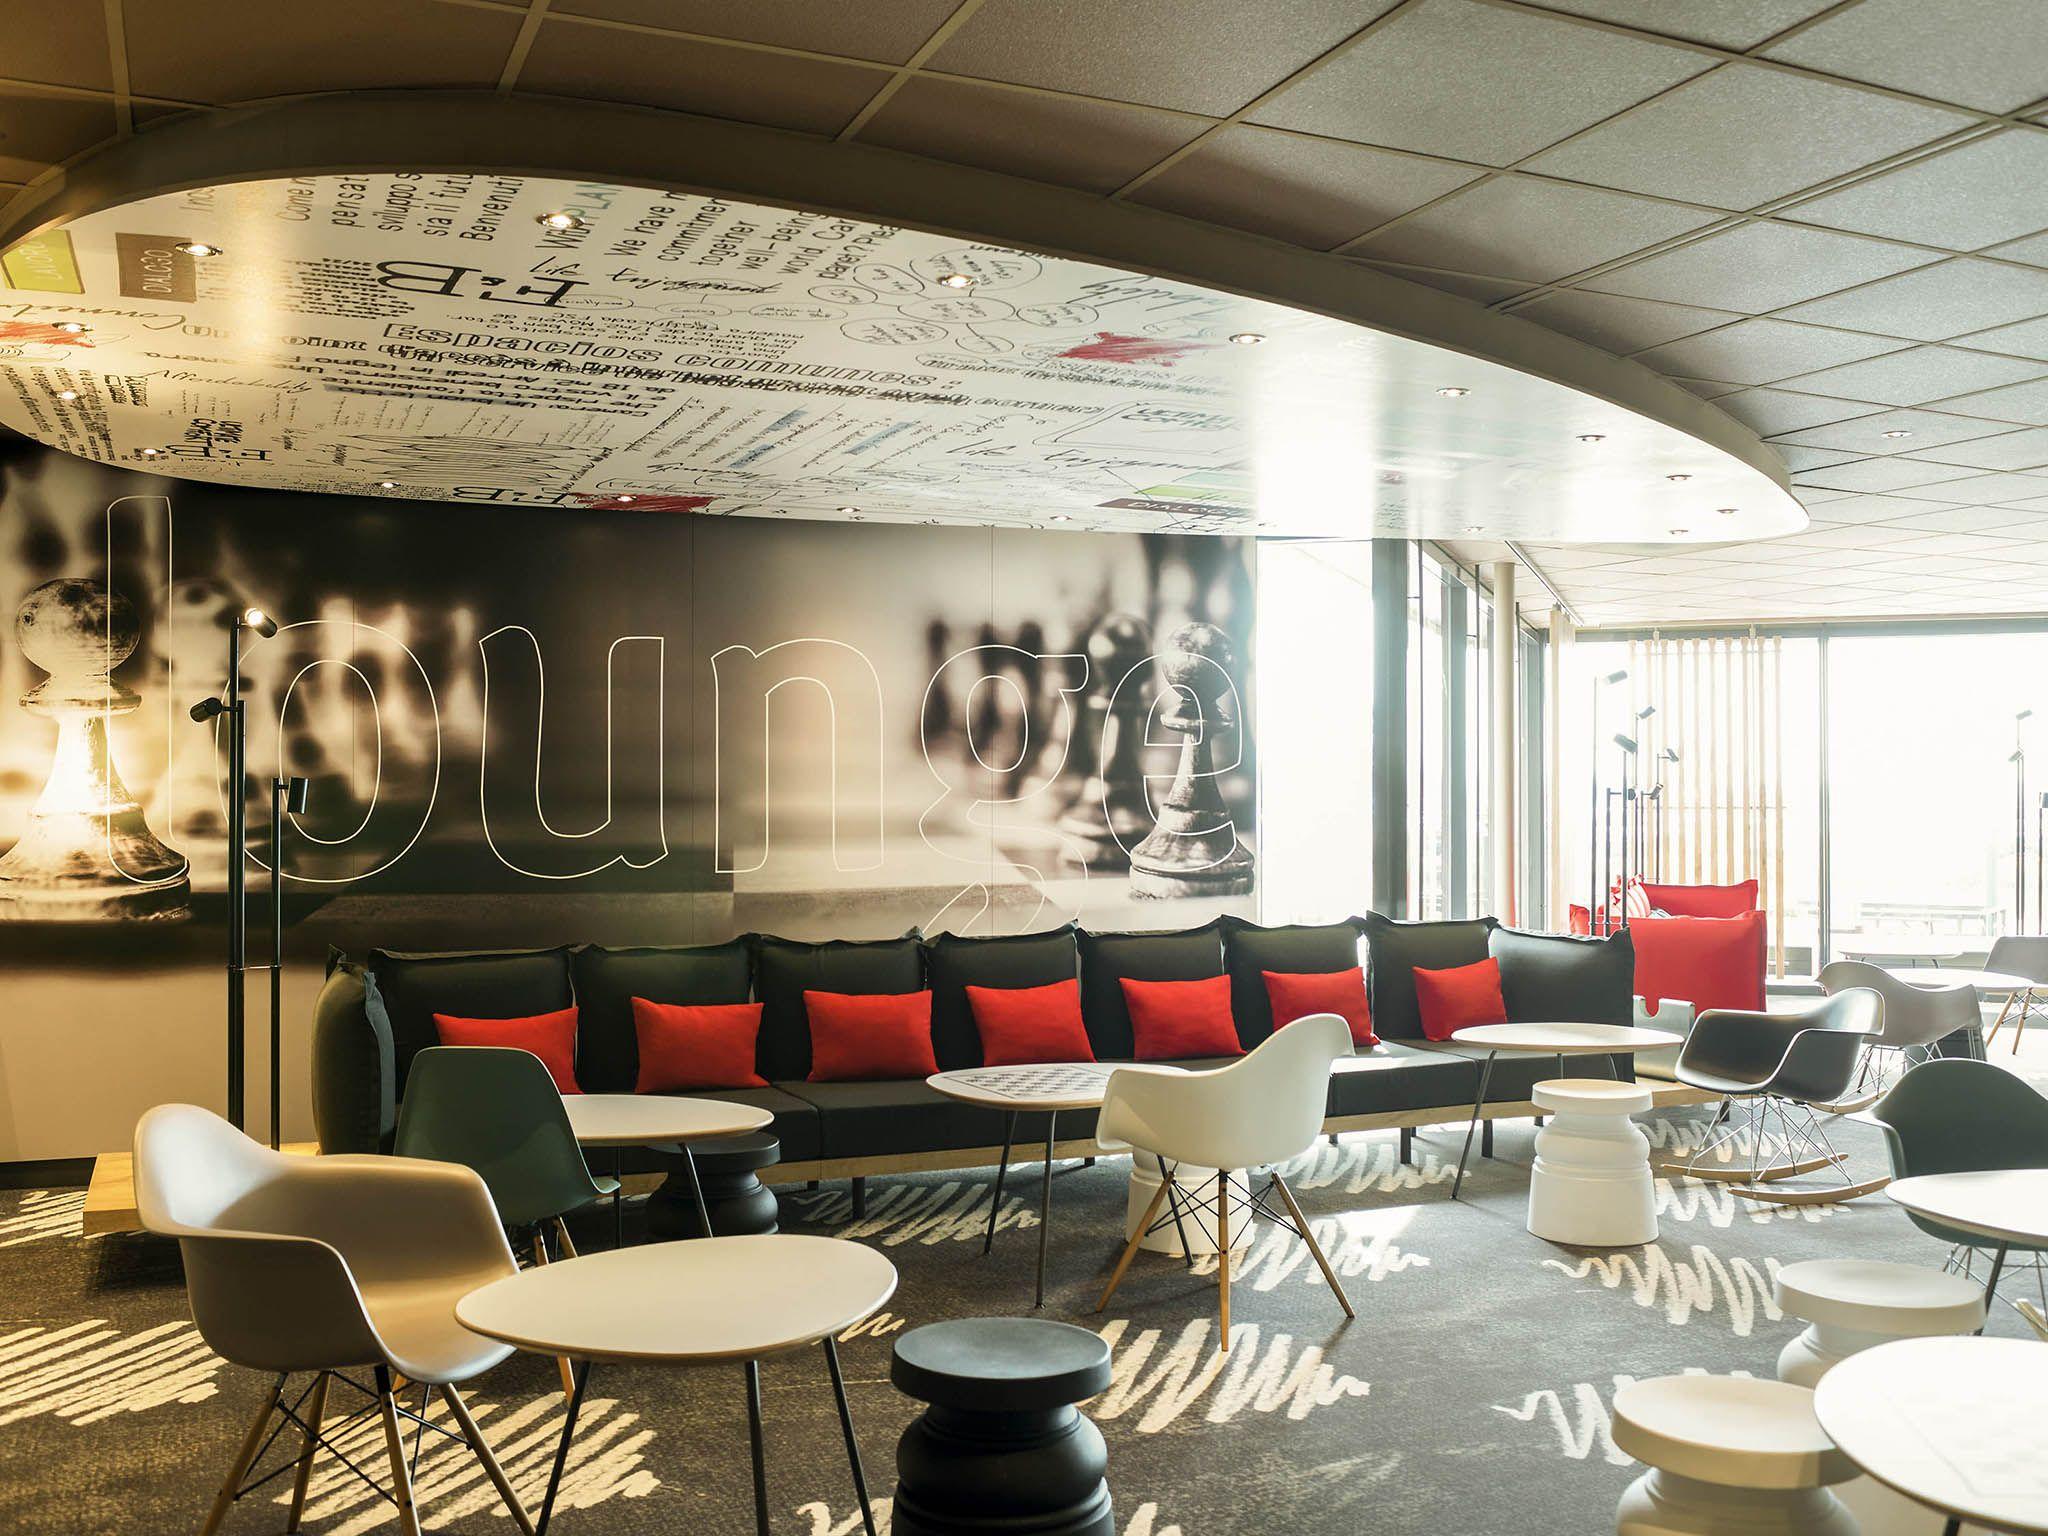 Hotel Ibis Schiphol Amsterdam Airport Cafe Restaurant Home